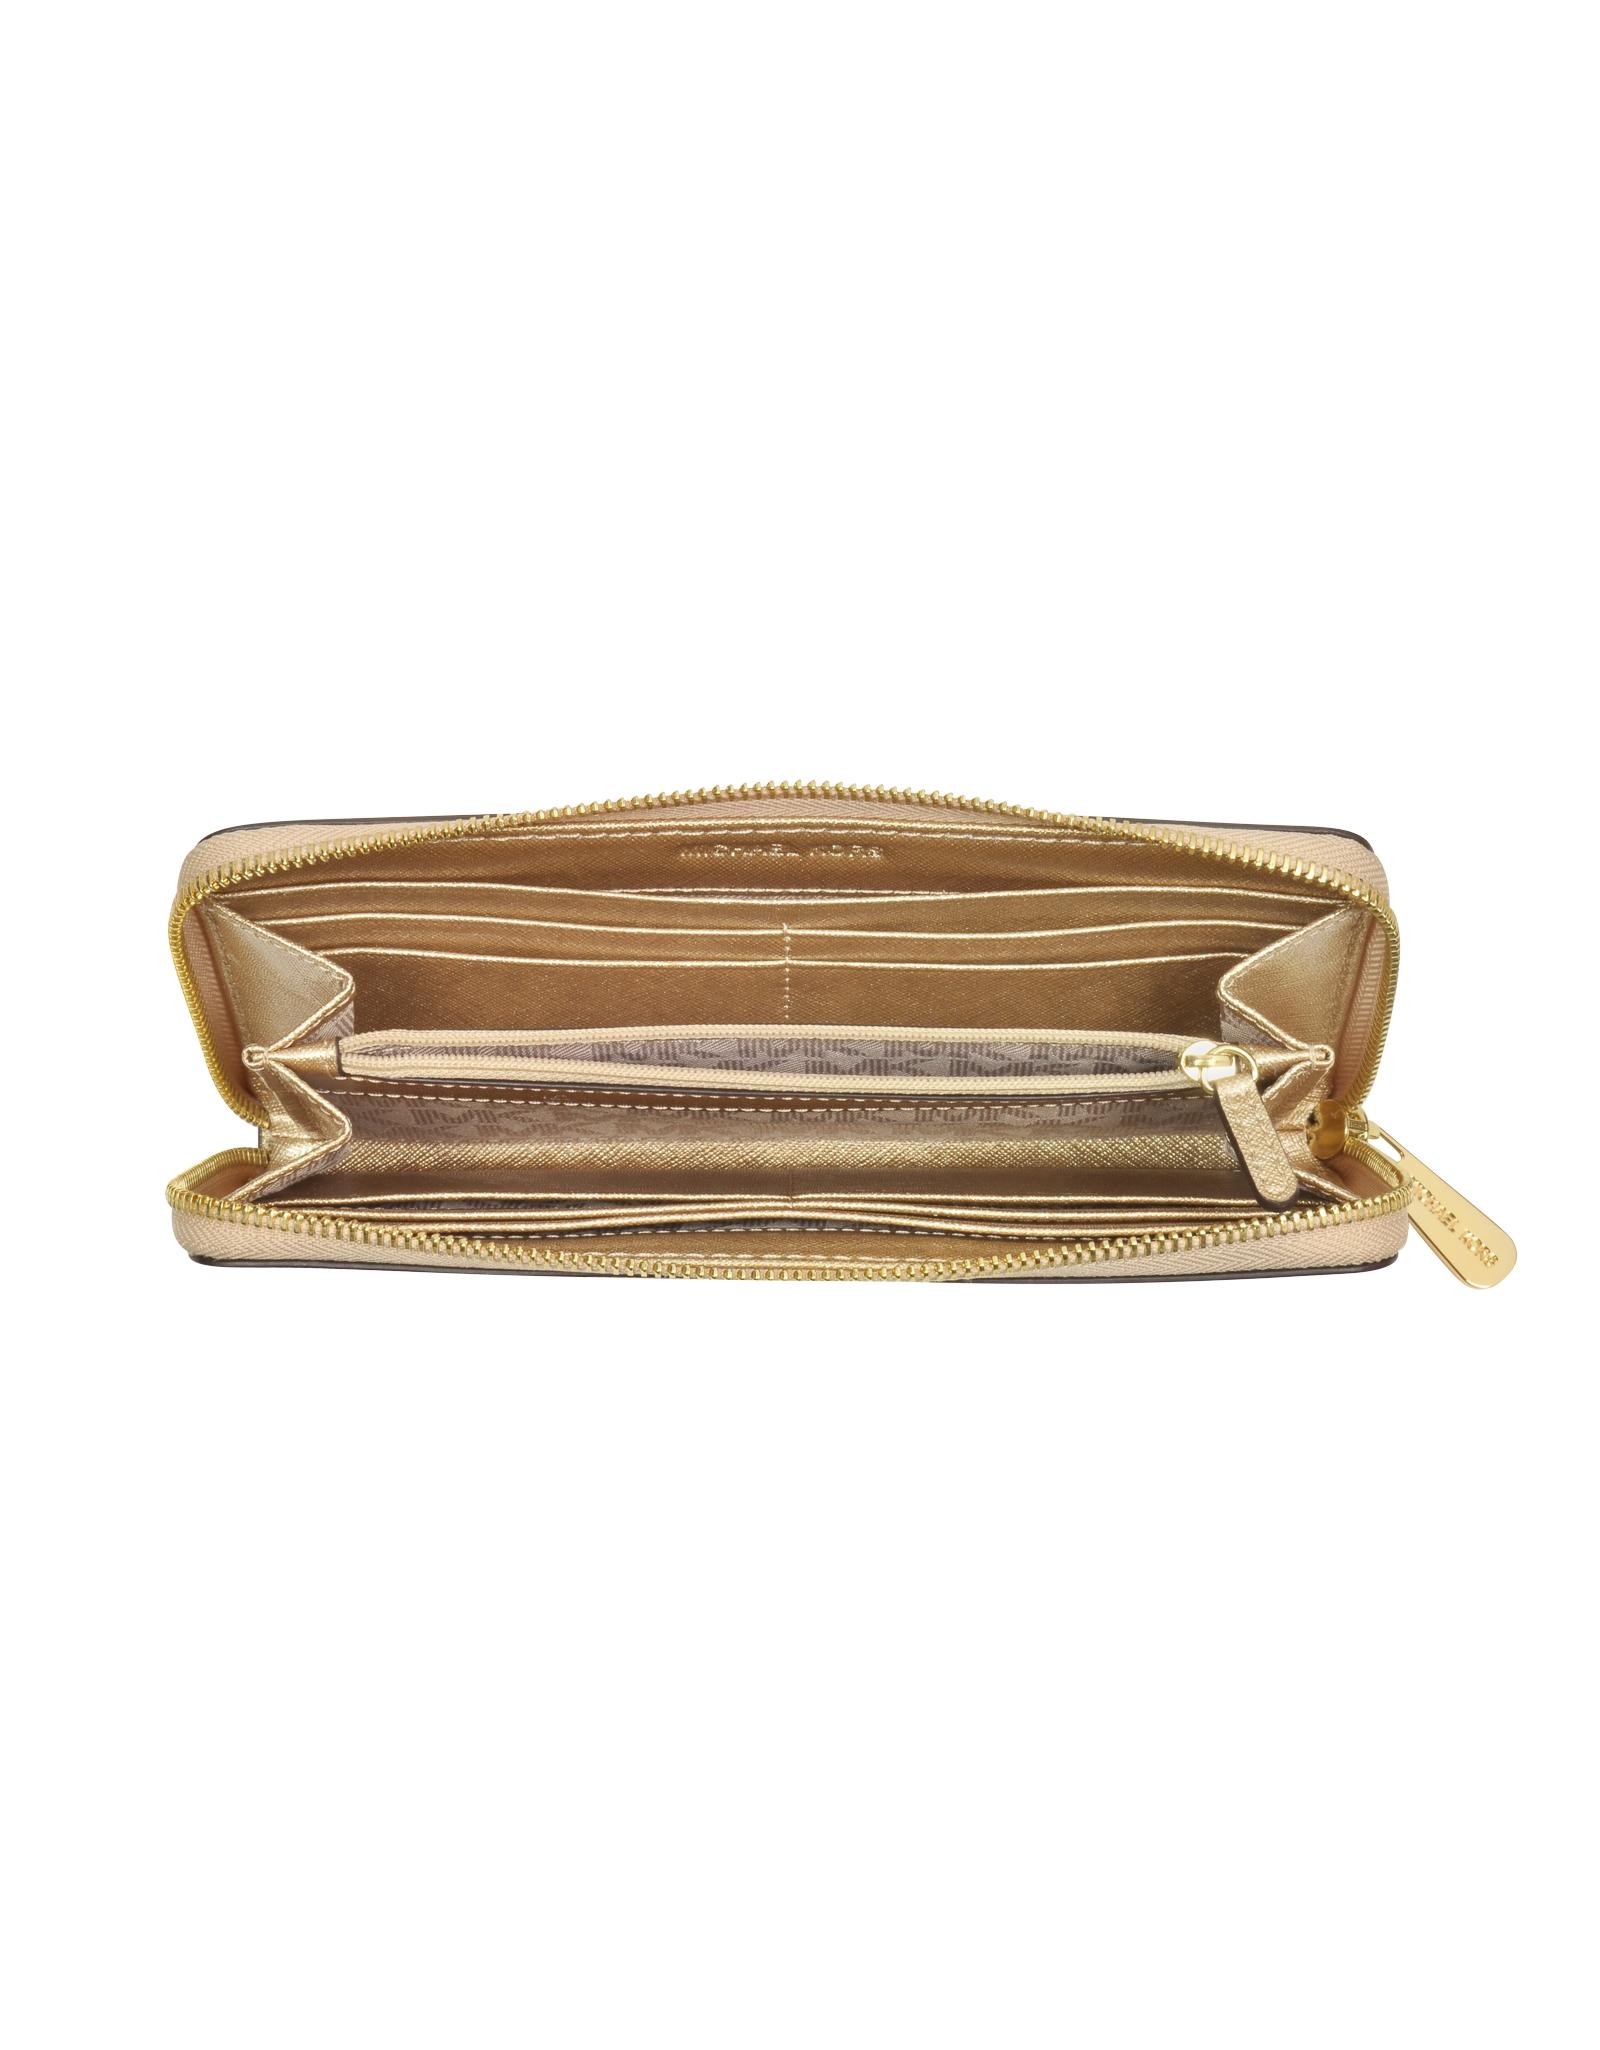 80bf2d6882345 Michael Kors Jet Set Travel Pale Gold Saffiano Leather Continental ...